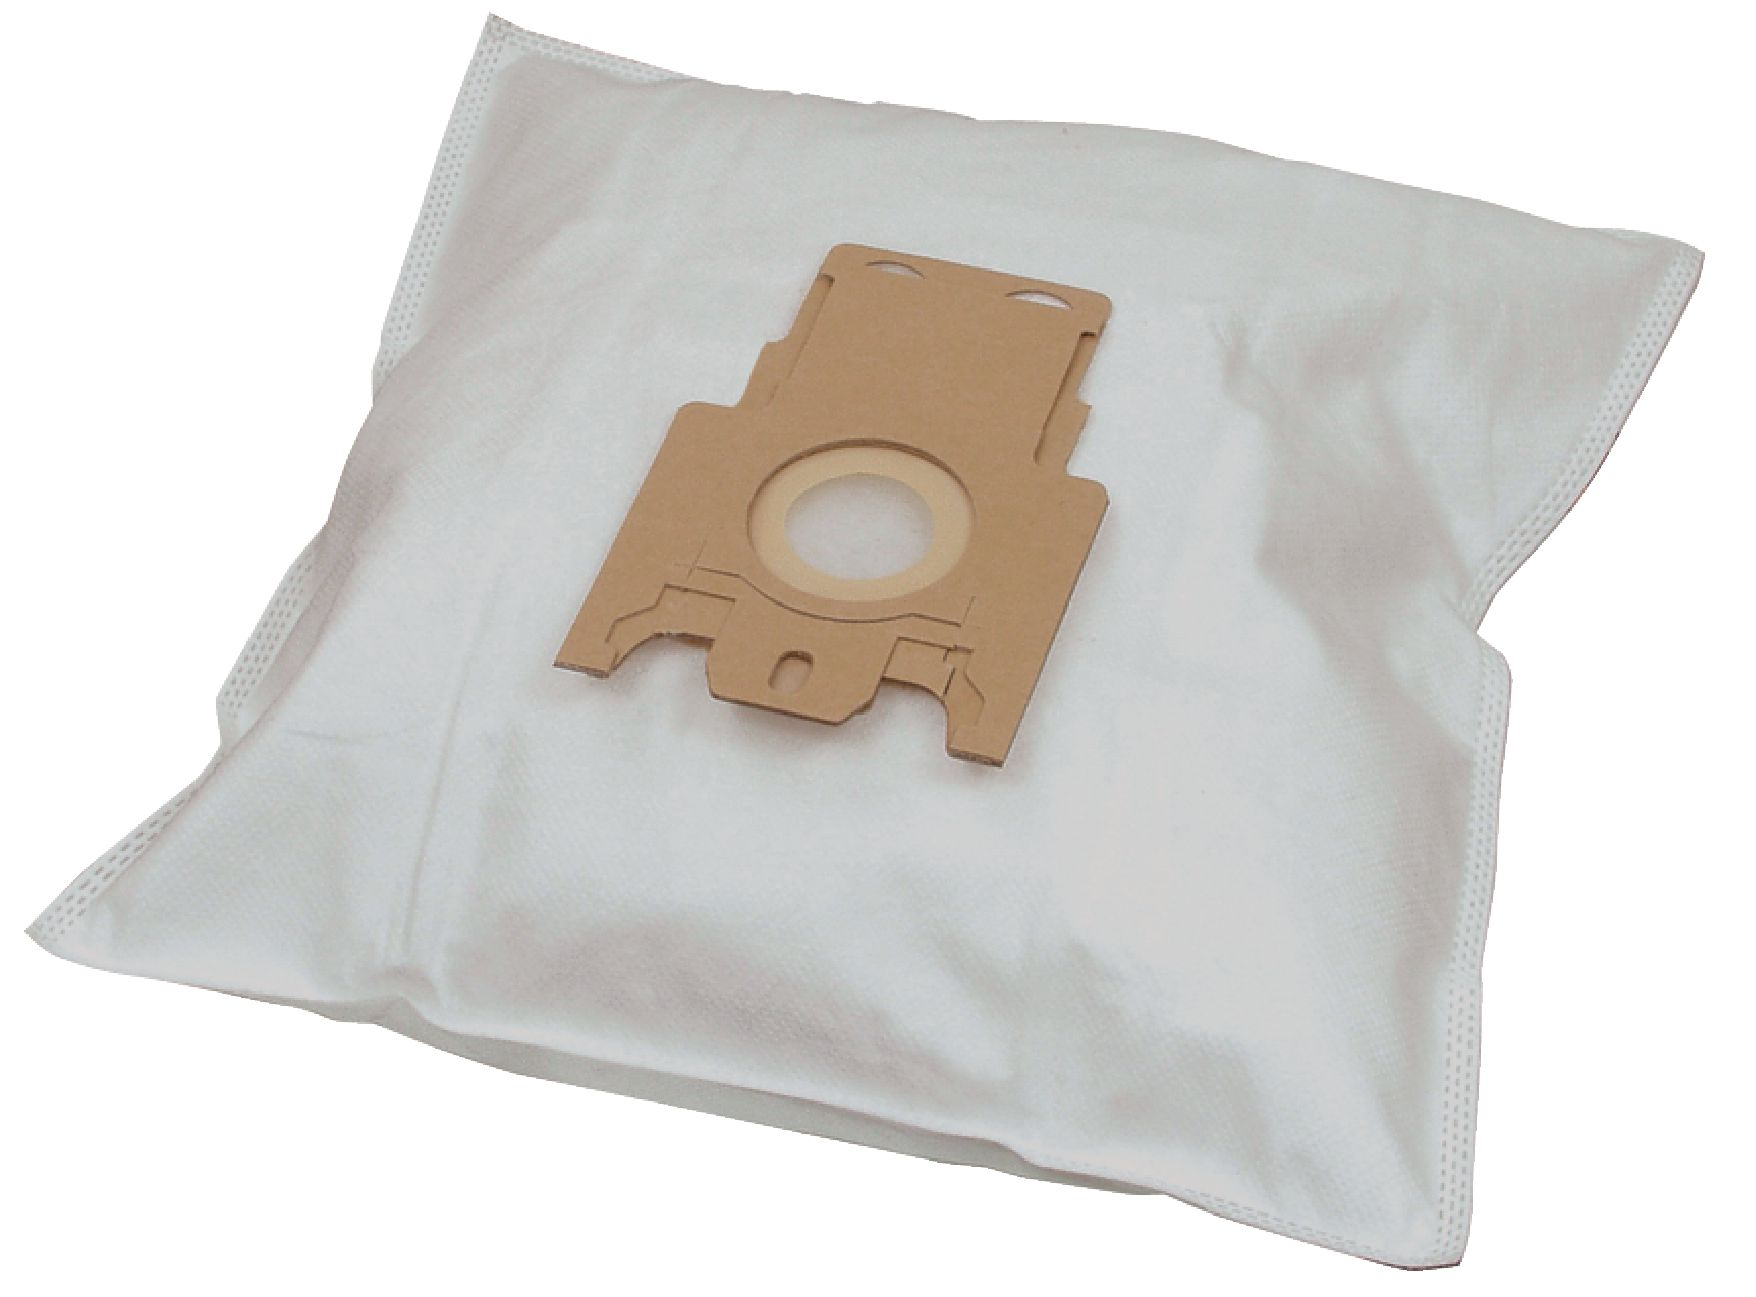 bxl 51416 basicxl replacement vacuum cleaner bag miele fjm gn electronic. Black Bedroom Furniture Sets. Home Design Ideas